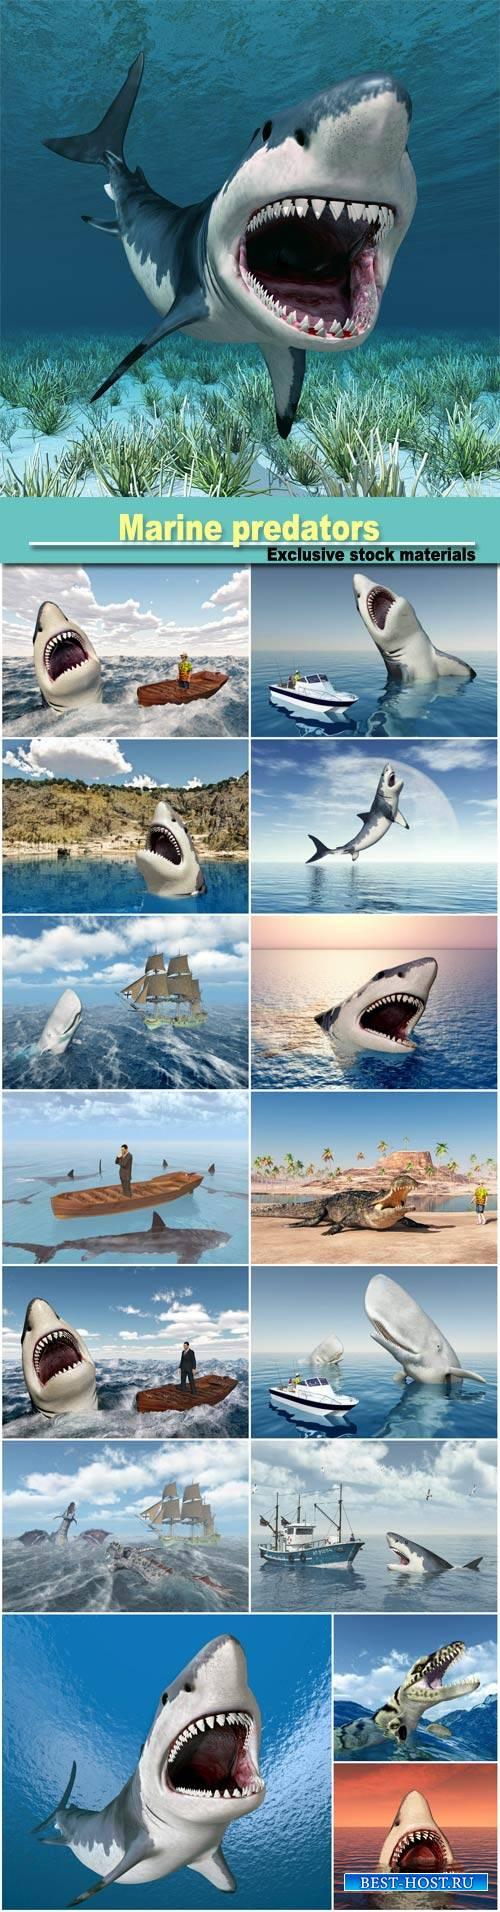 Marine predators, sharks 3D illustration